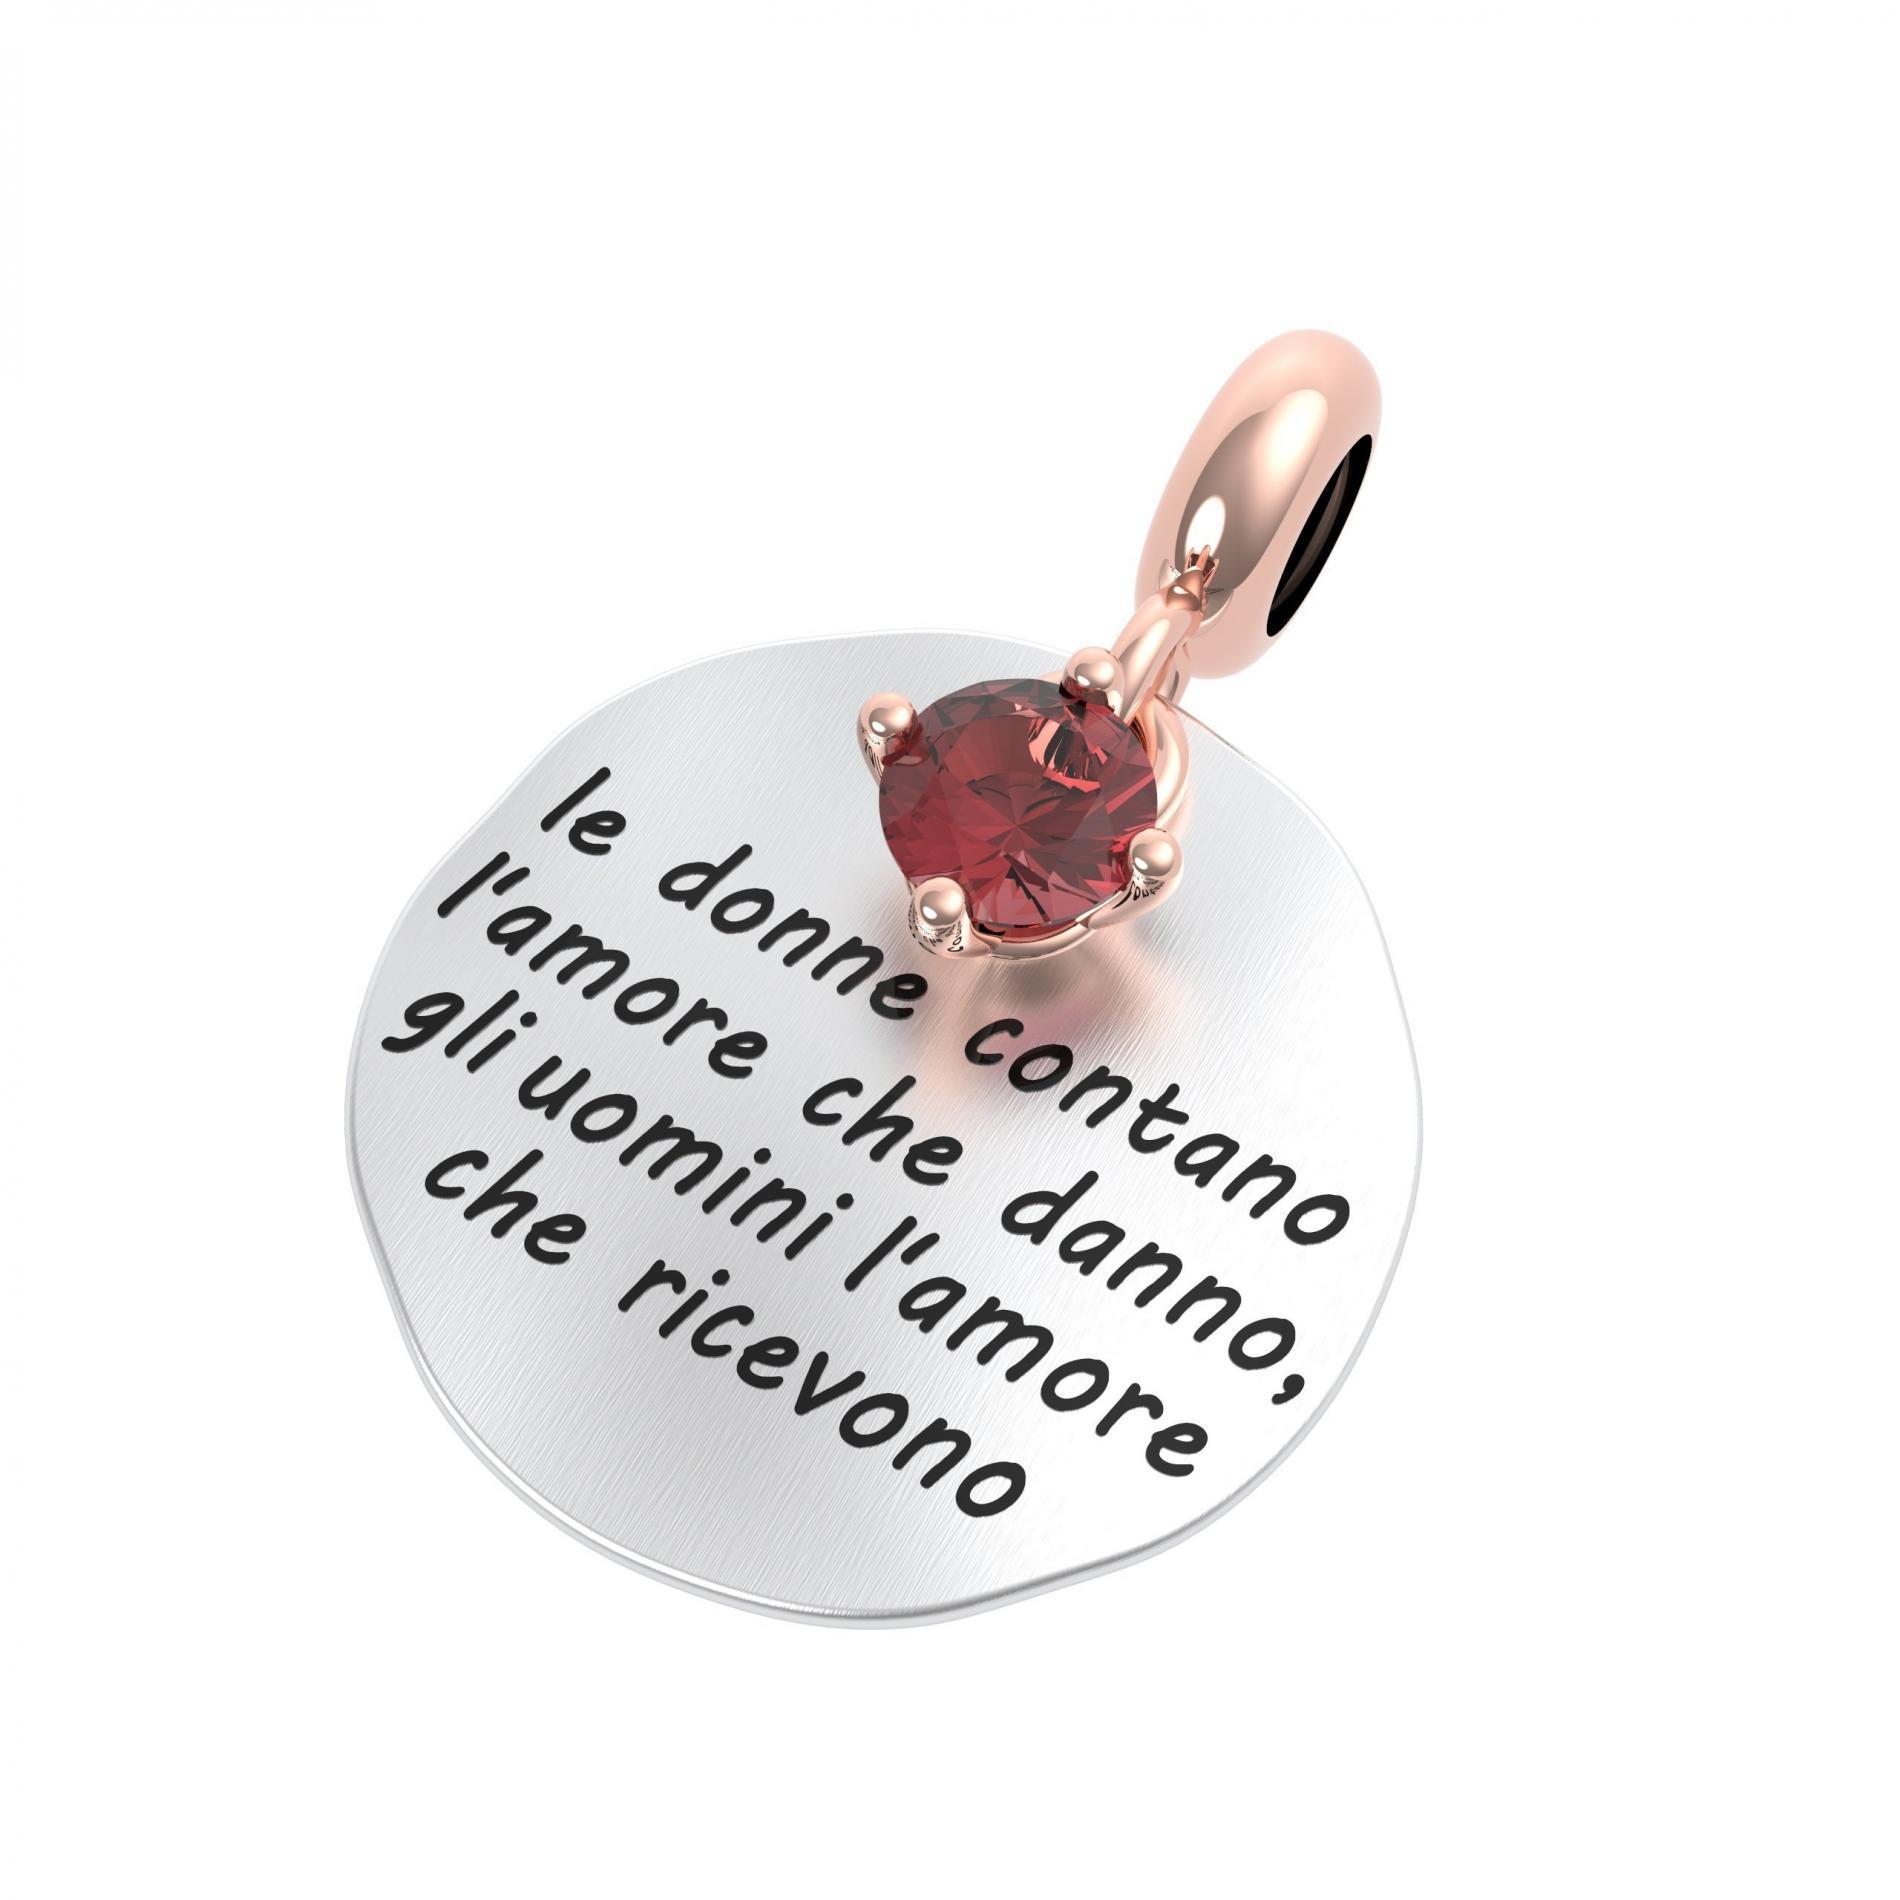 Ciondolo argento rerum 25004 musa